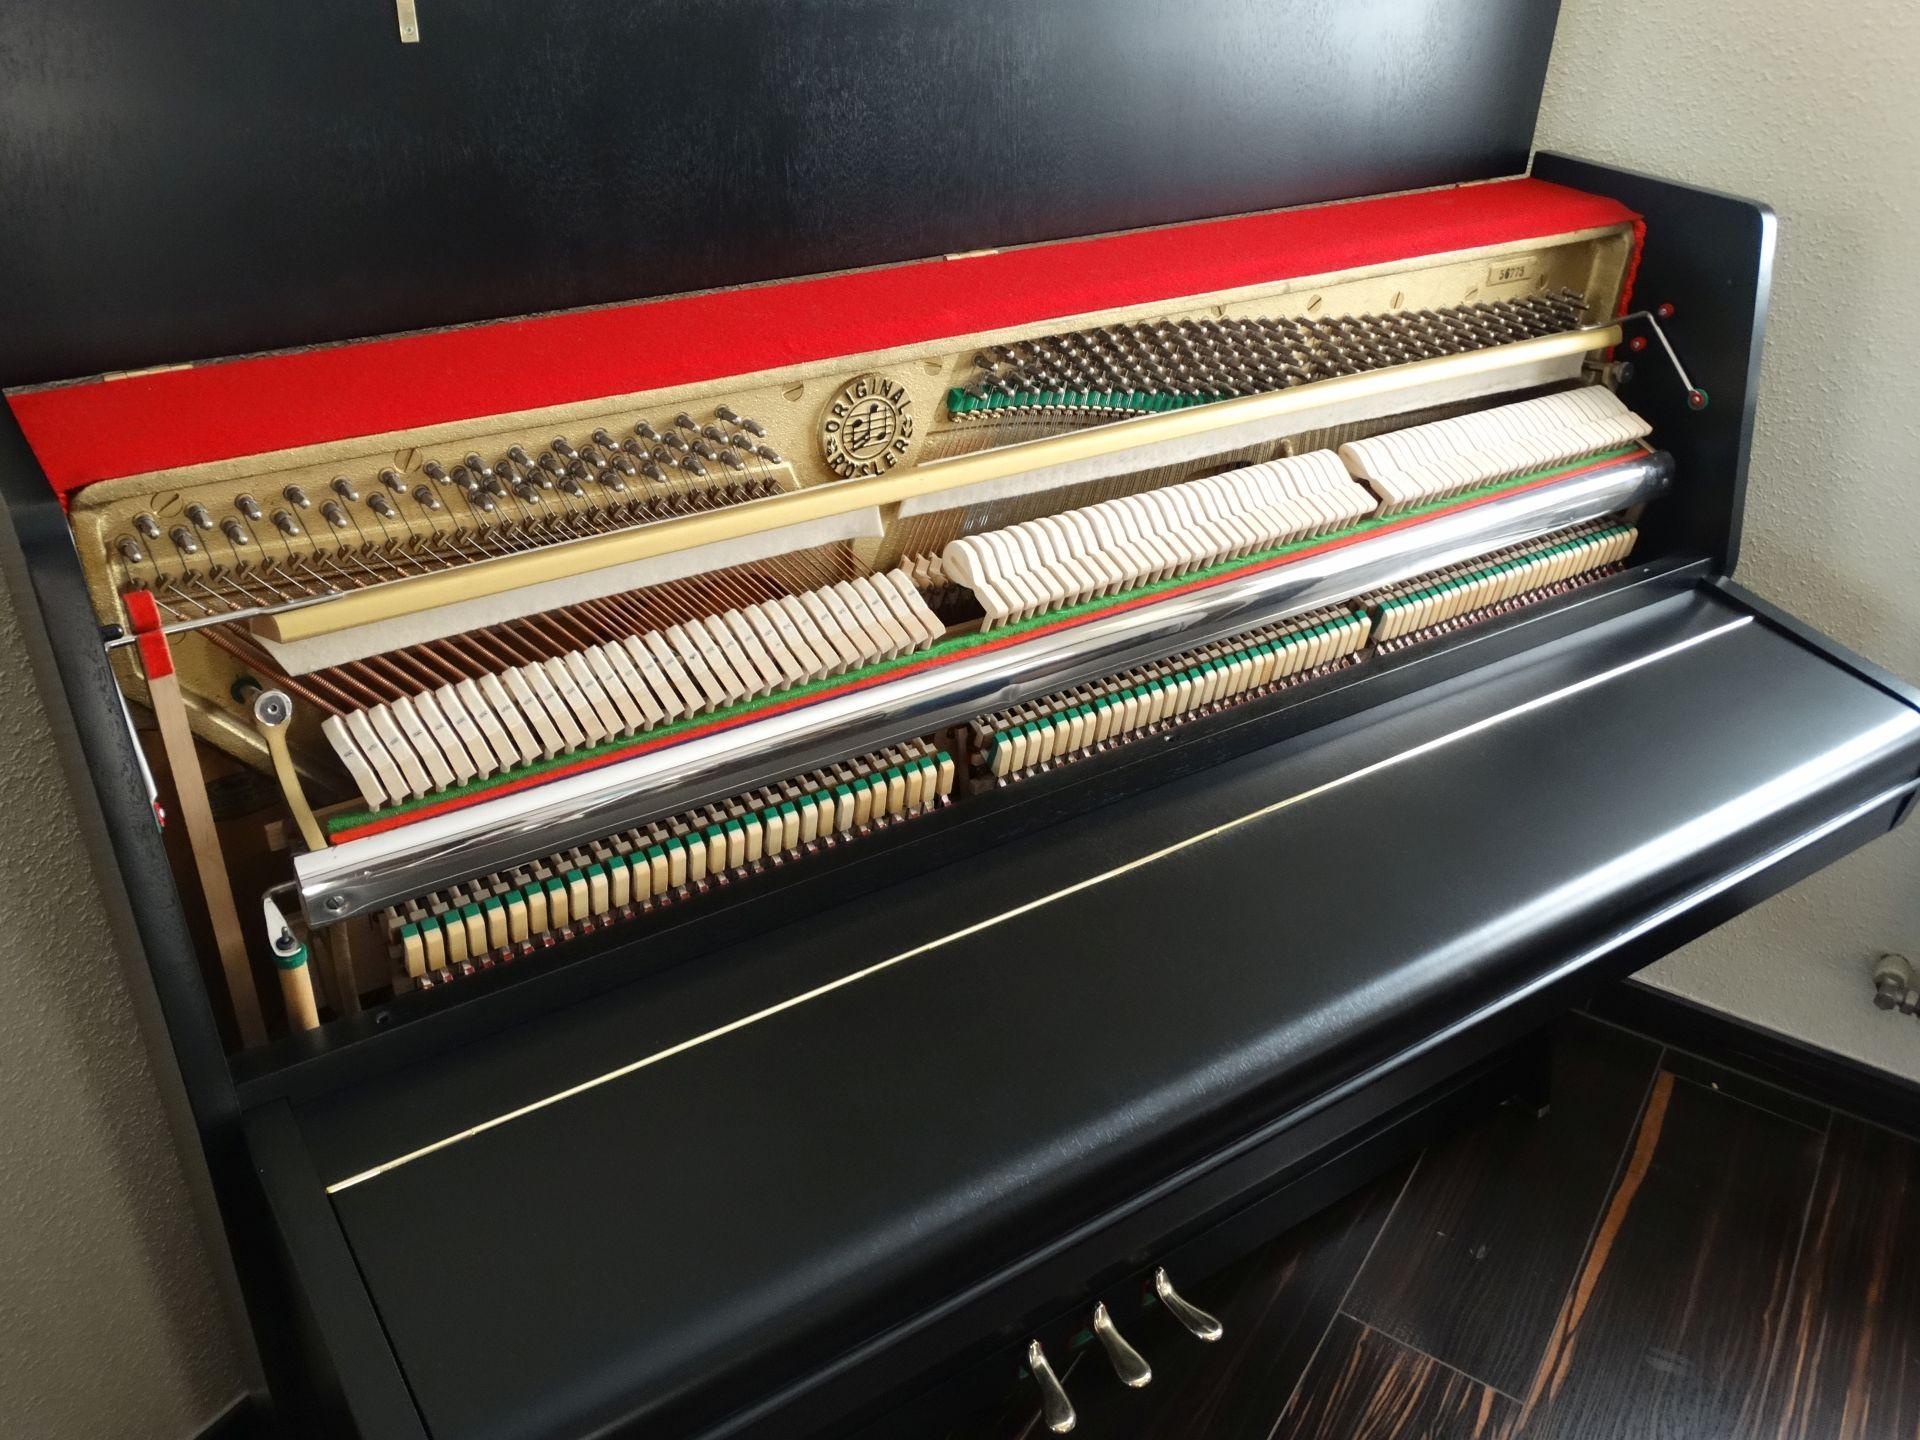 czarne pianino rosler petrof idealne gwarancja